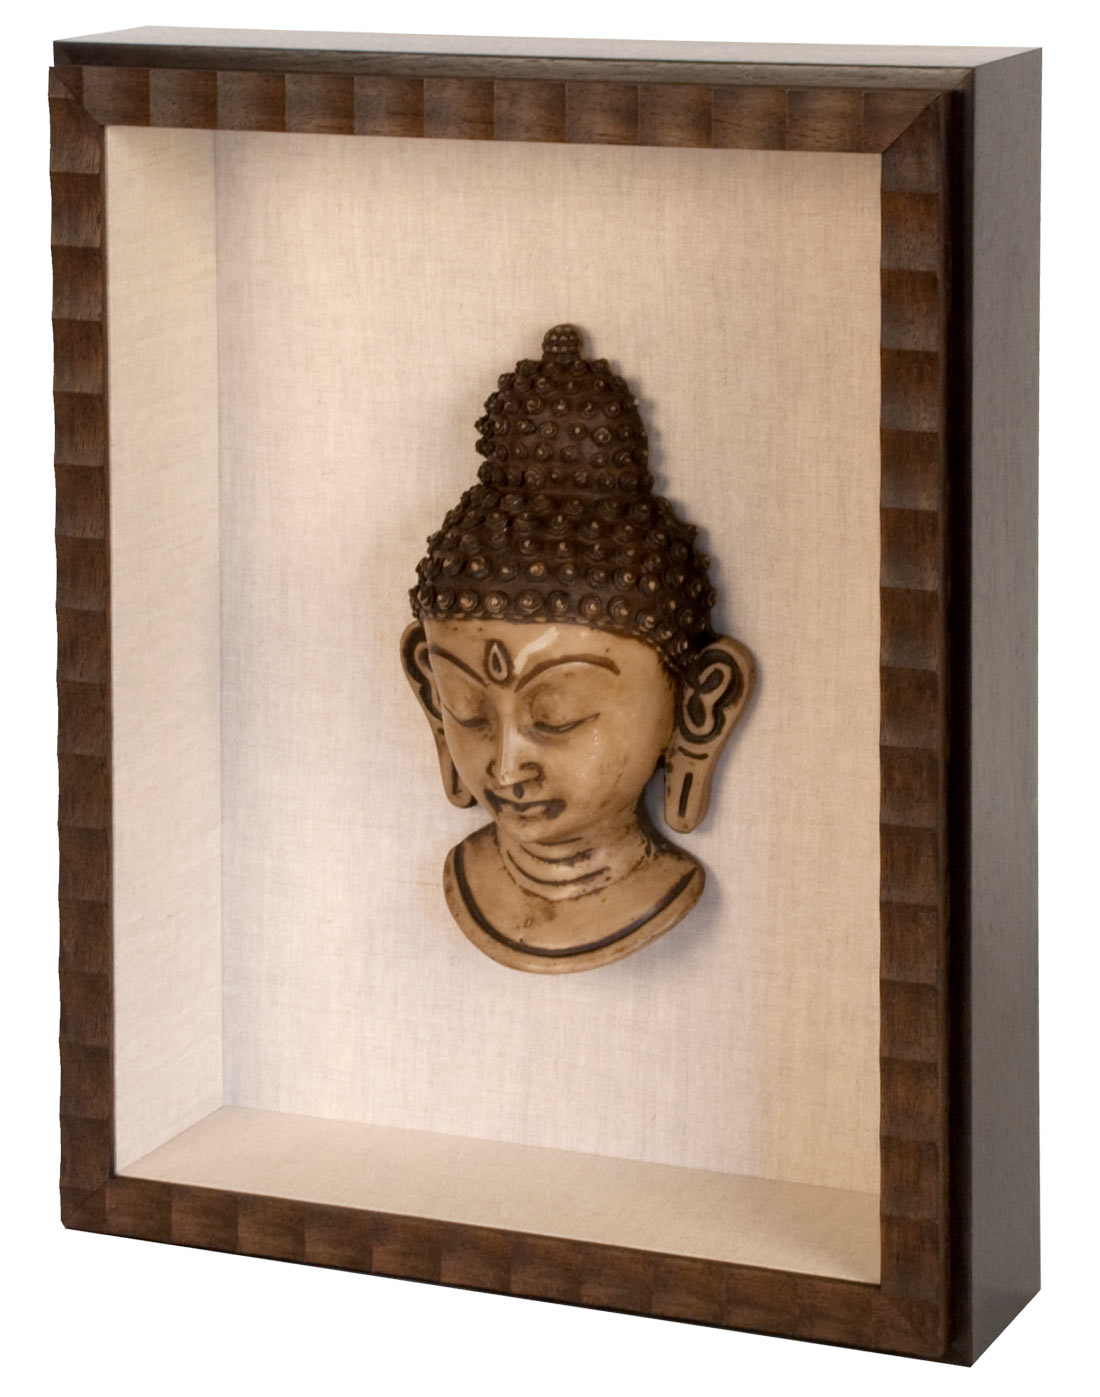 headsculpturefromindia_web.jpg